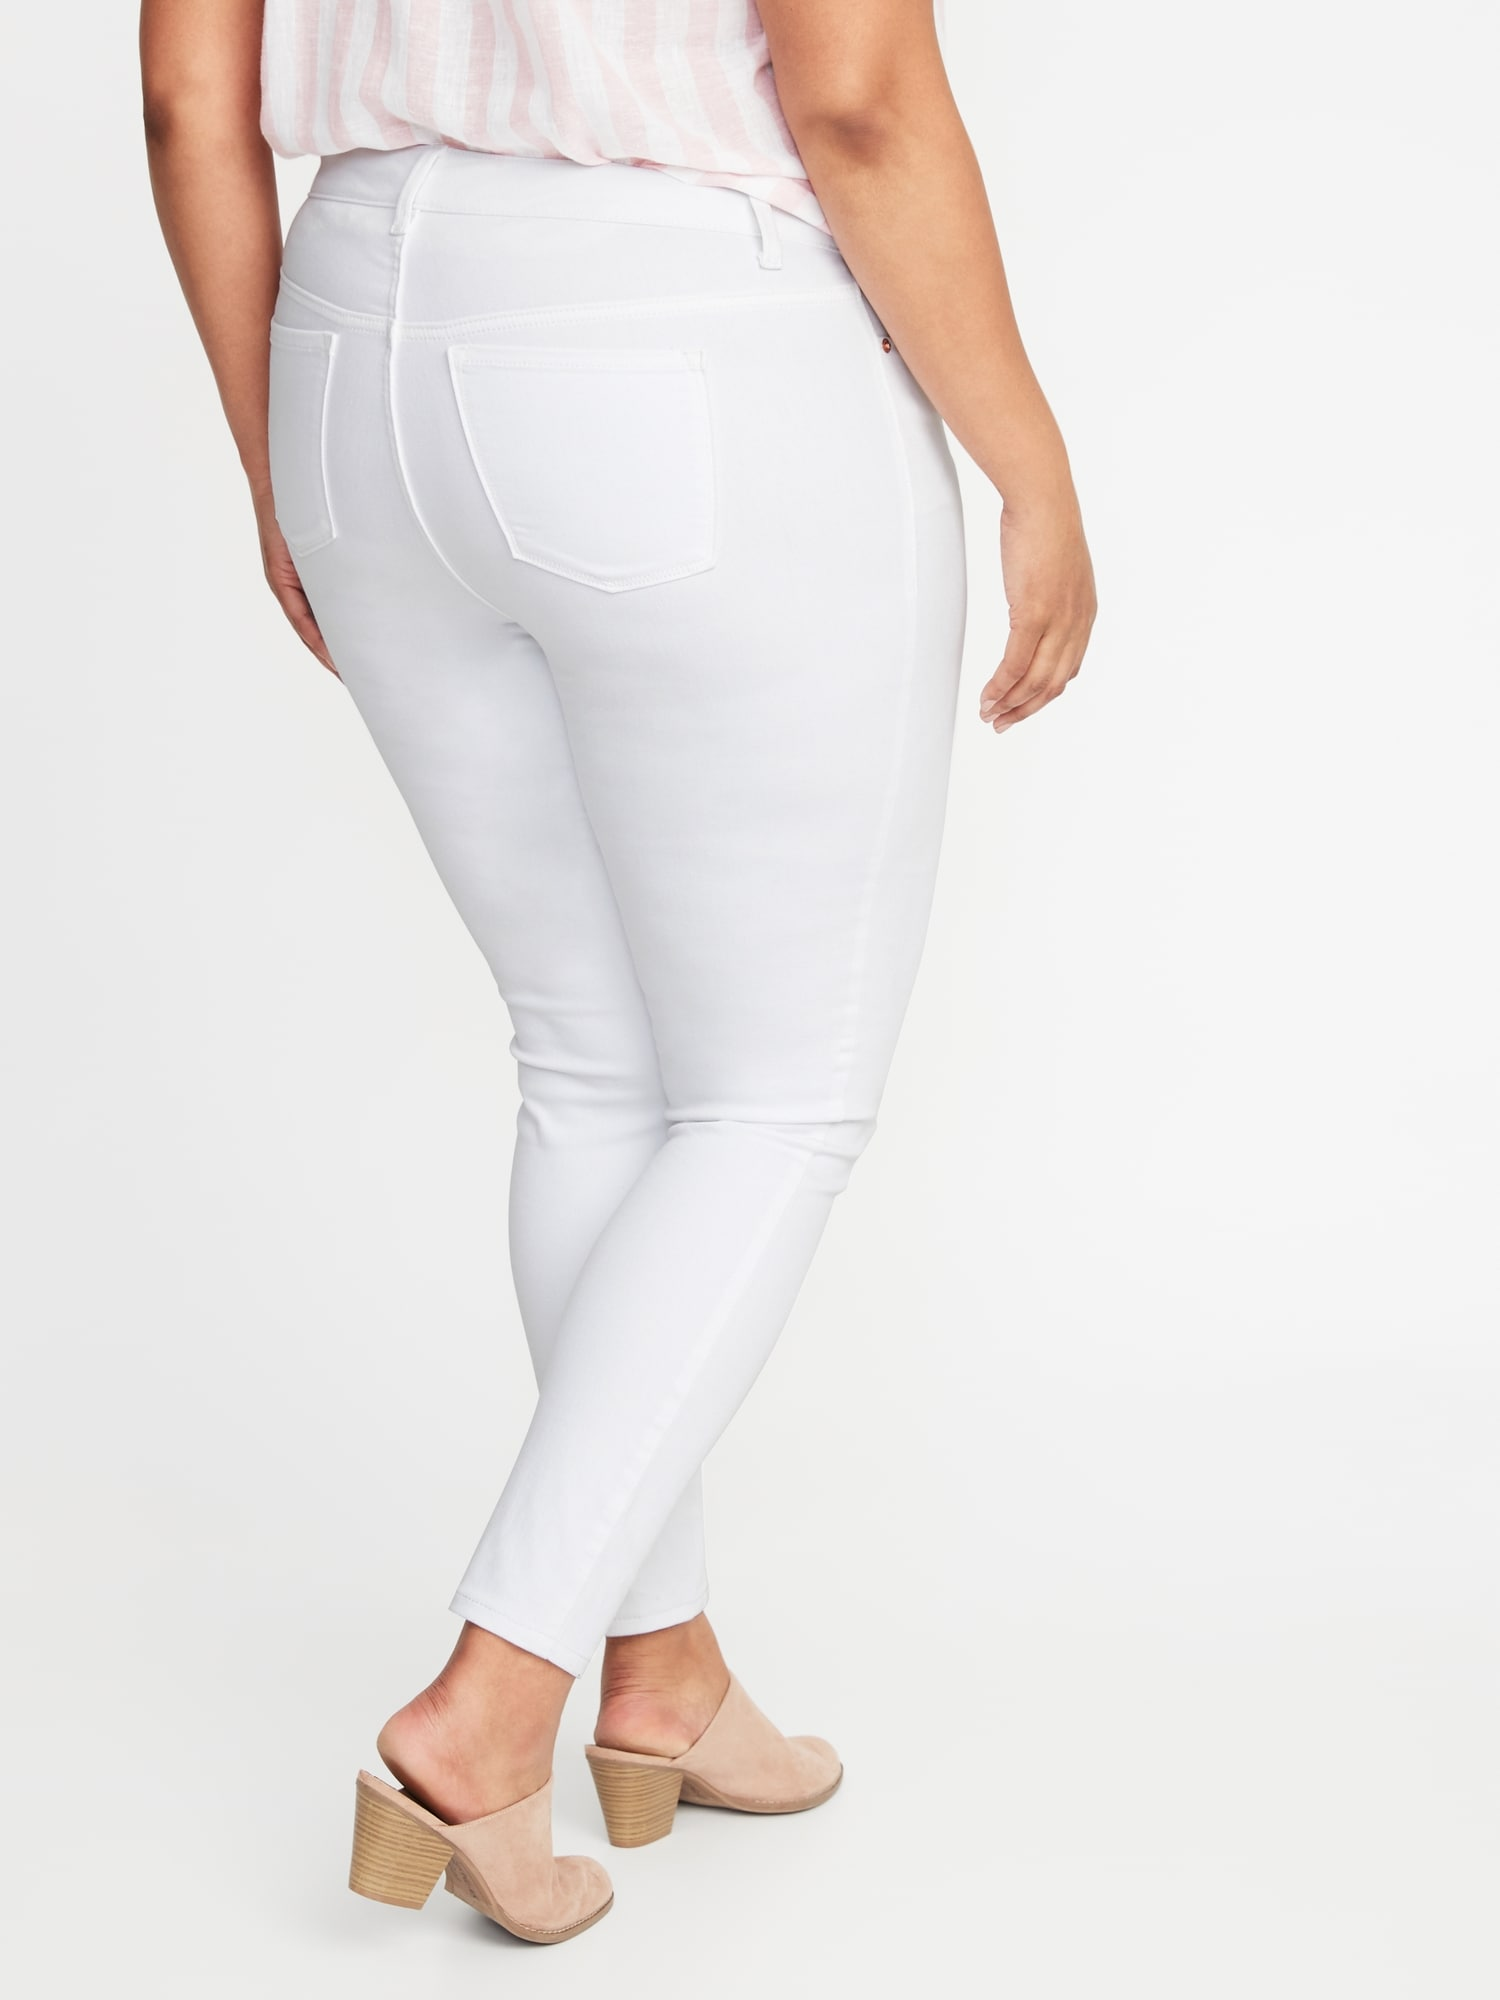 c13ae4a37f9 High-Rise Secret-Slim Pockets Plus-Size Rockstar Super Skinny White Jeans